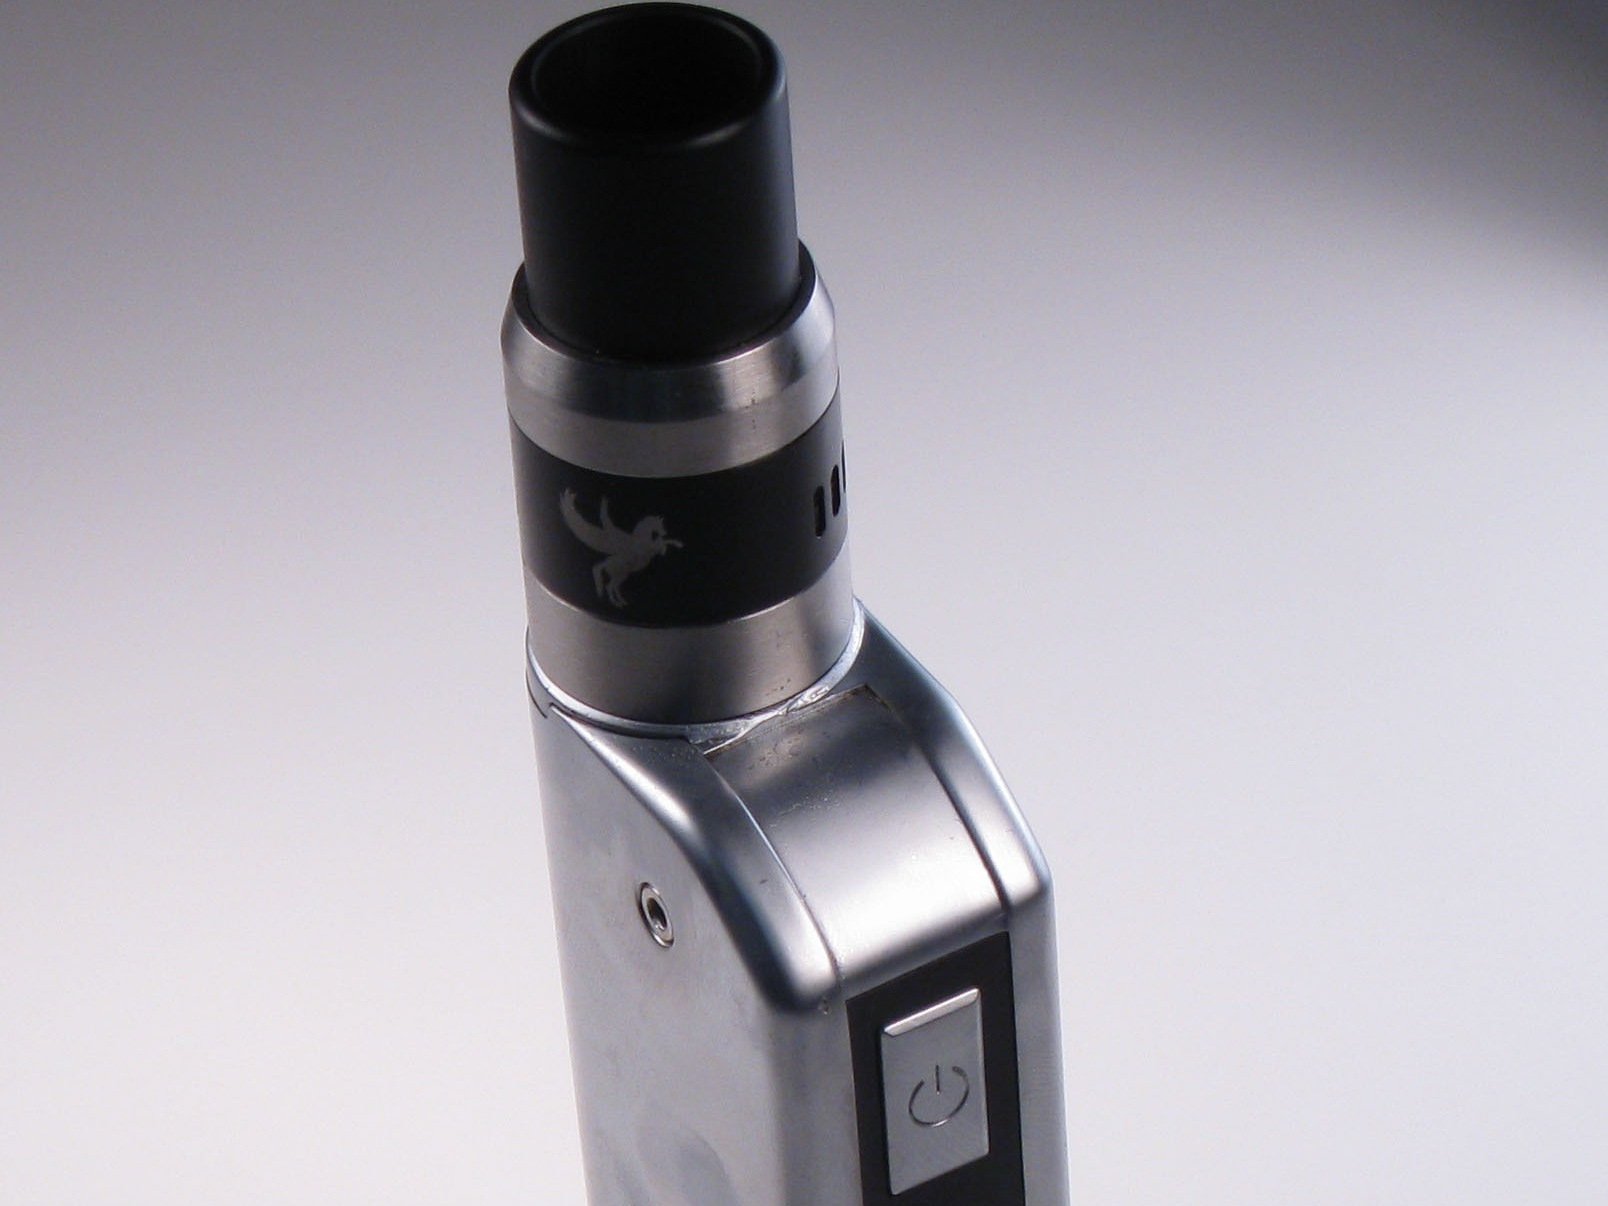 E-Cigarette Vaporizer Repair - iFixit